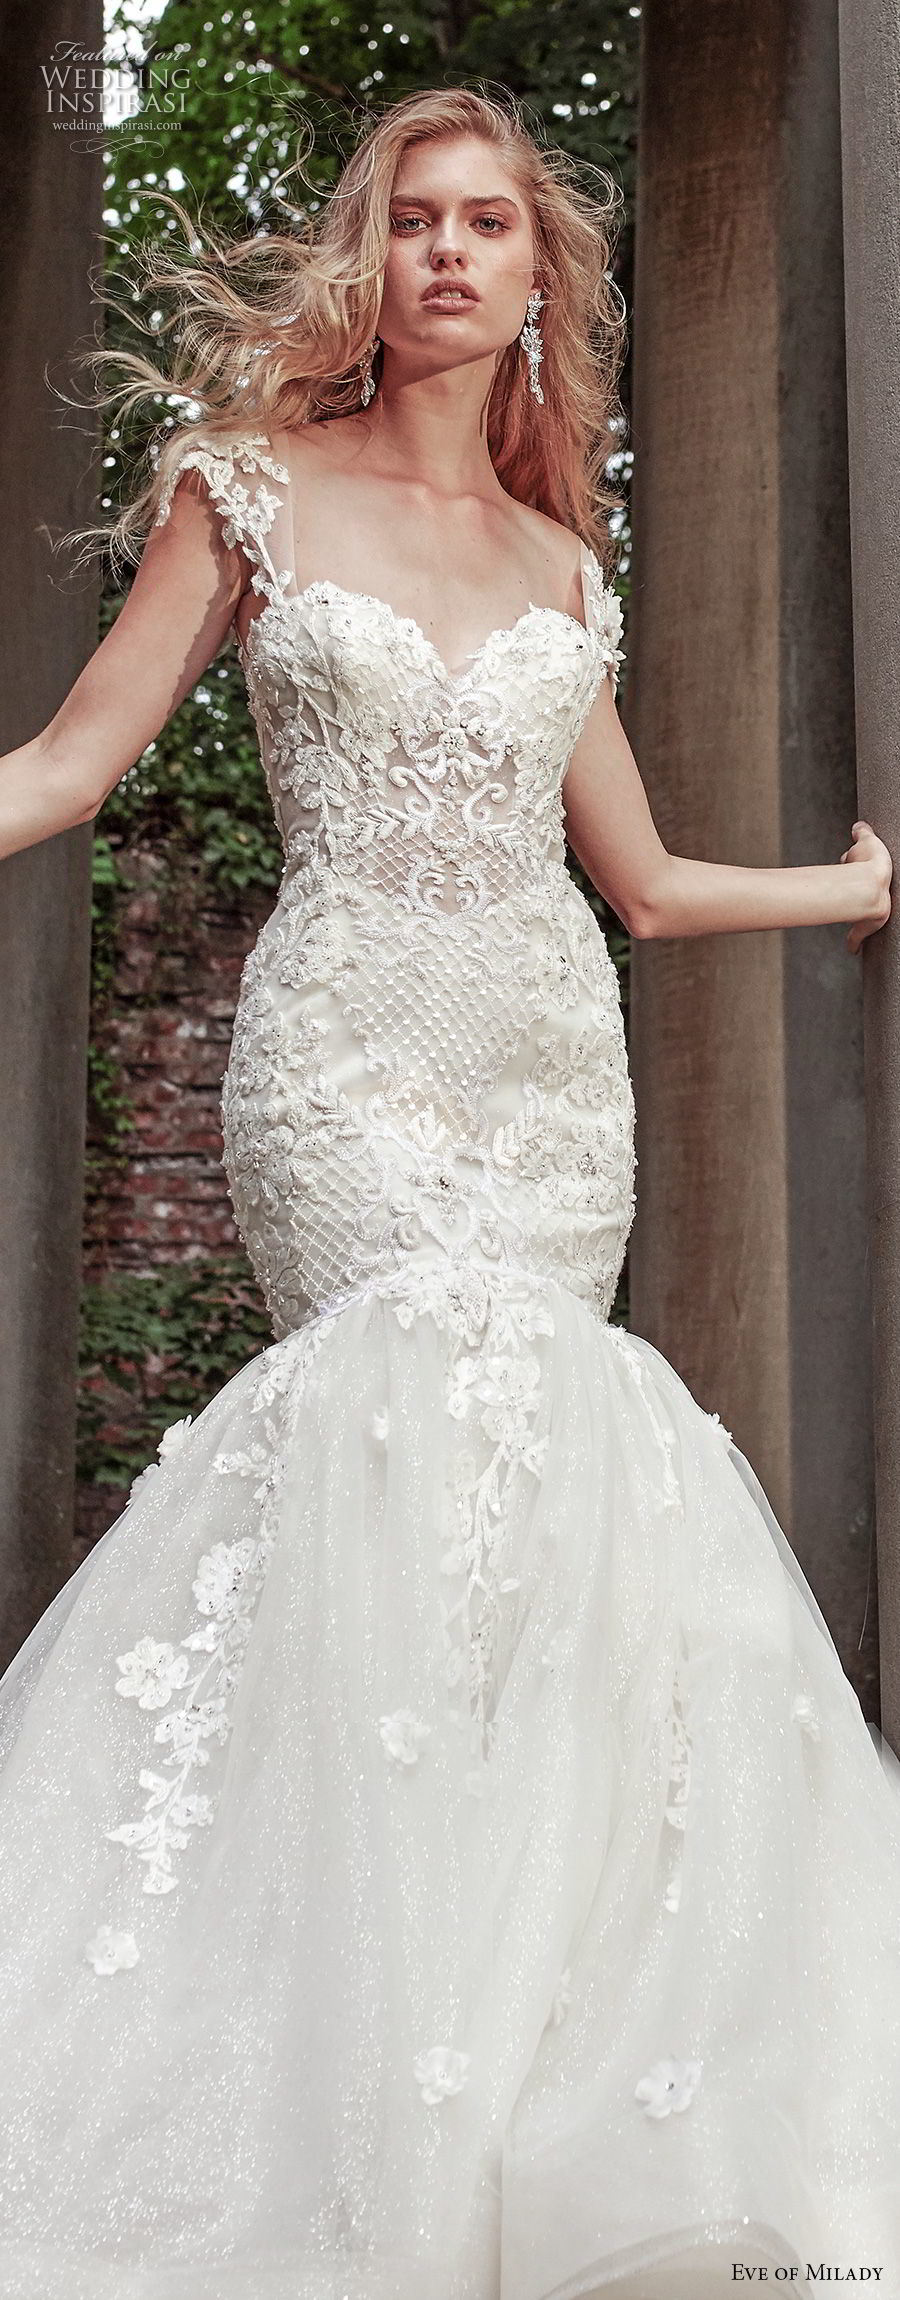 2018 Bridal Evening Gowns Cap Sleeve Lace Mermaid Wedding Dresses Z2081